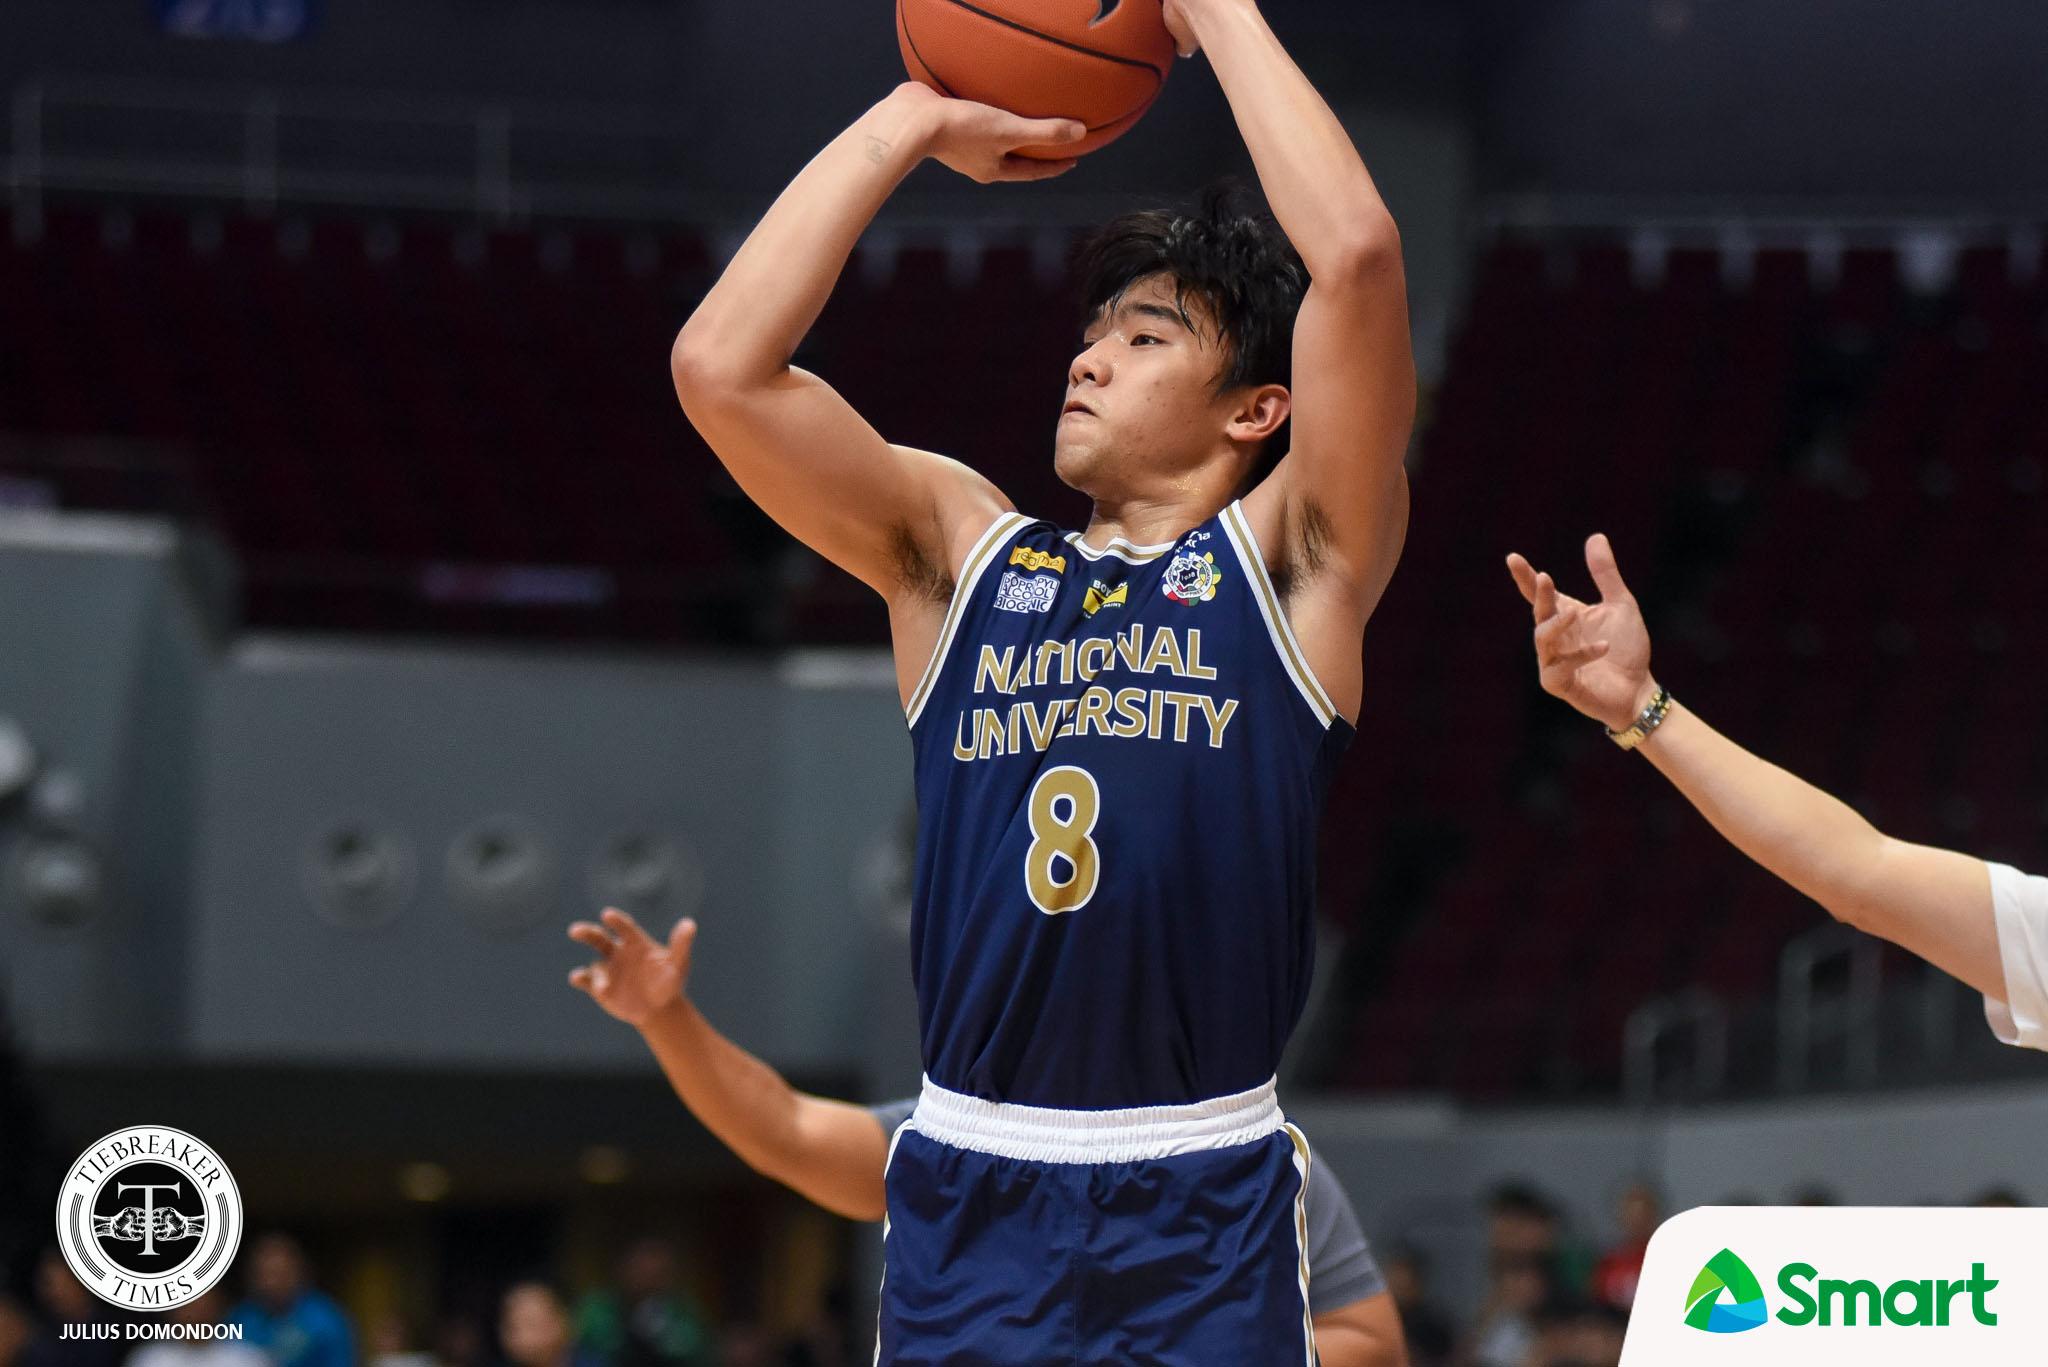 UAAP82-MBB-1ST-PHOTO-NU-MIGZ-OCZON Migs Oczon leaves NU Basketball News NU UAAP  - philippine sports news